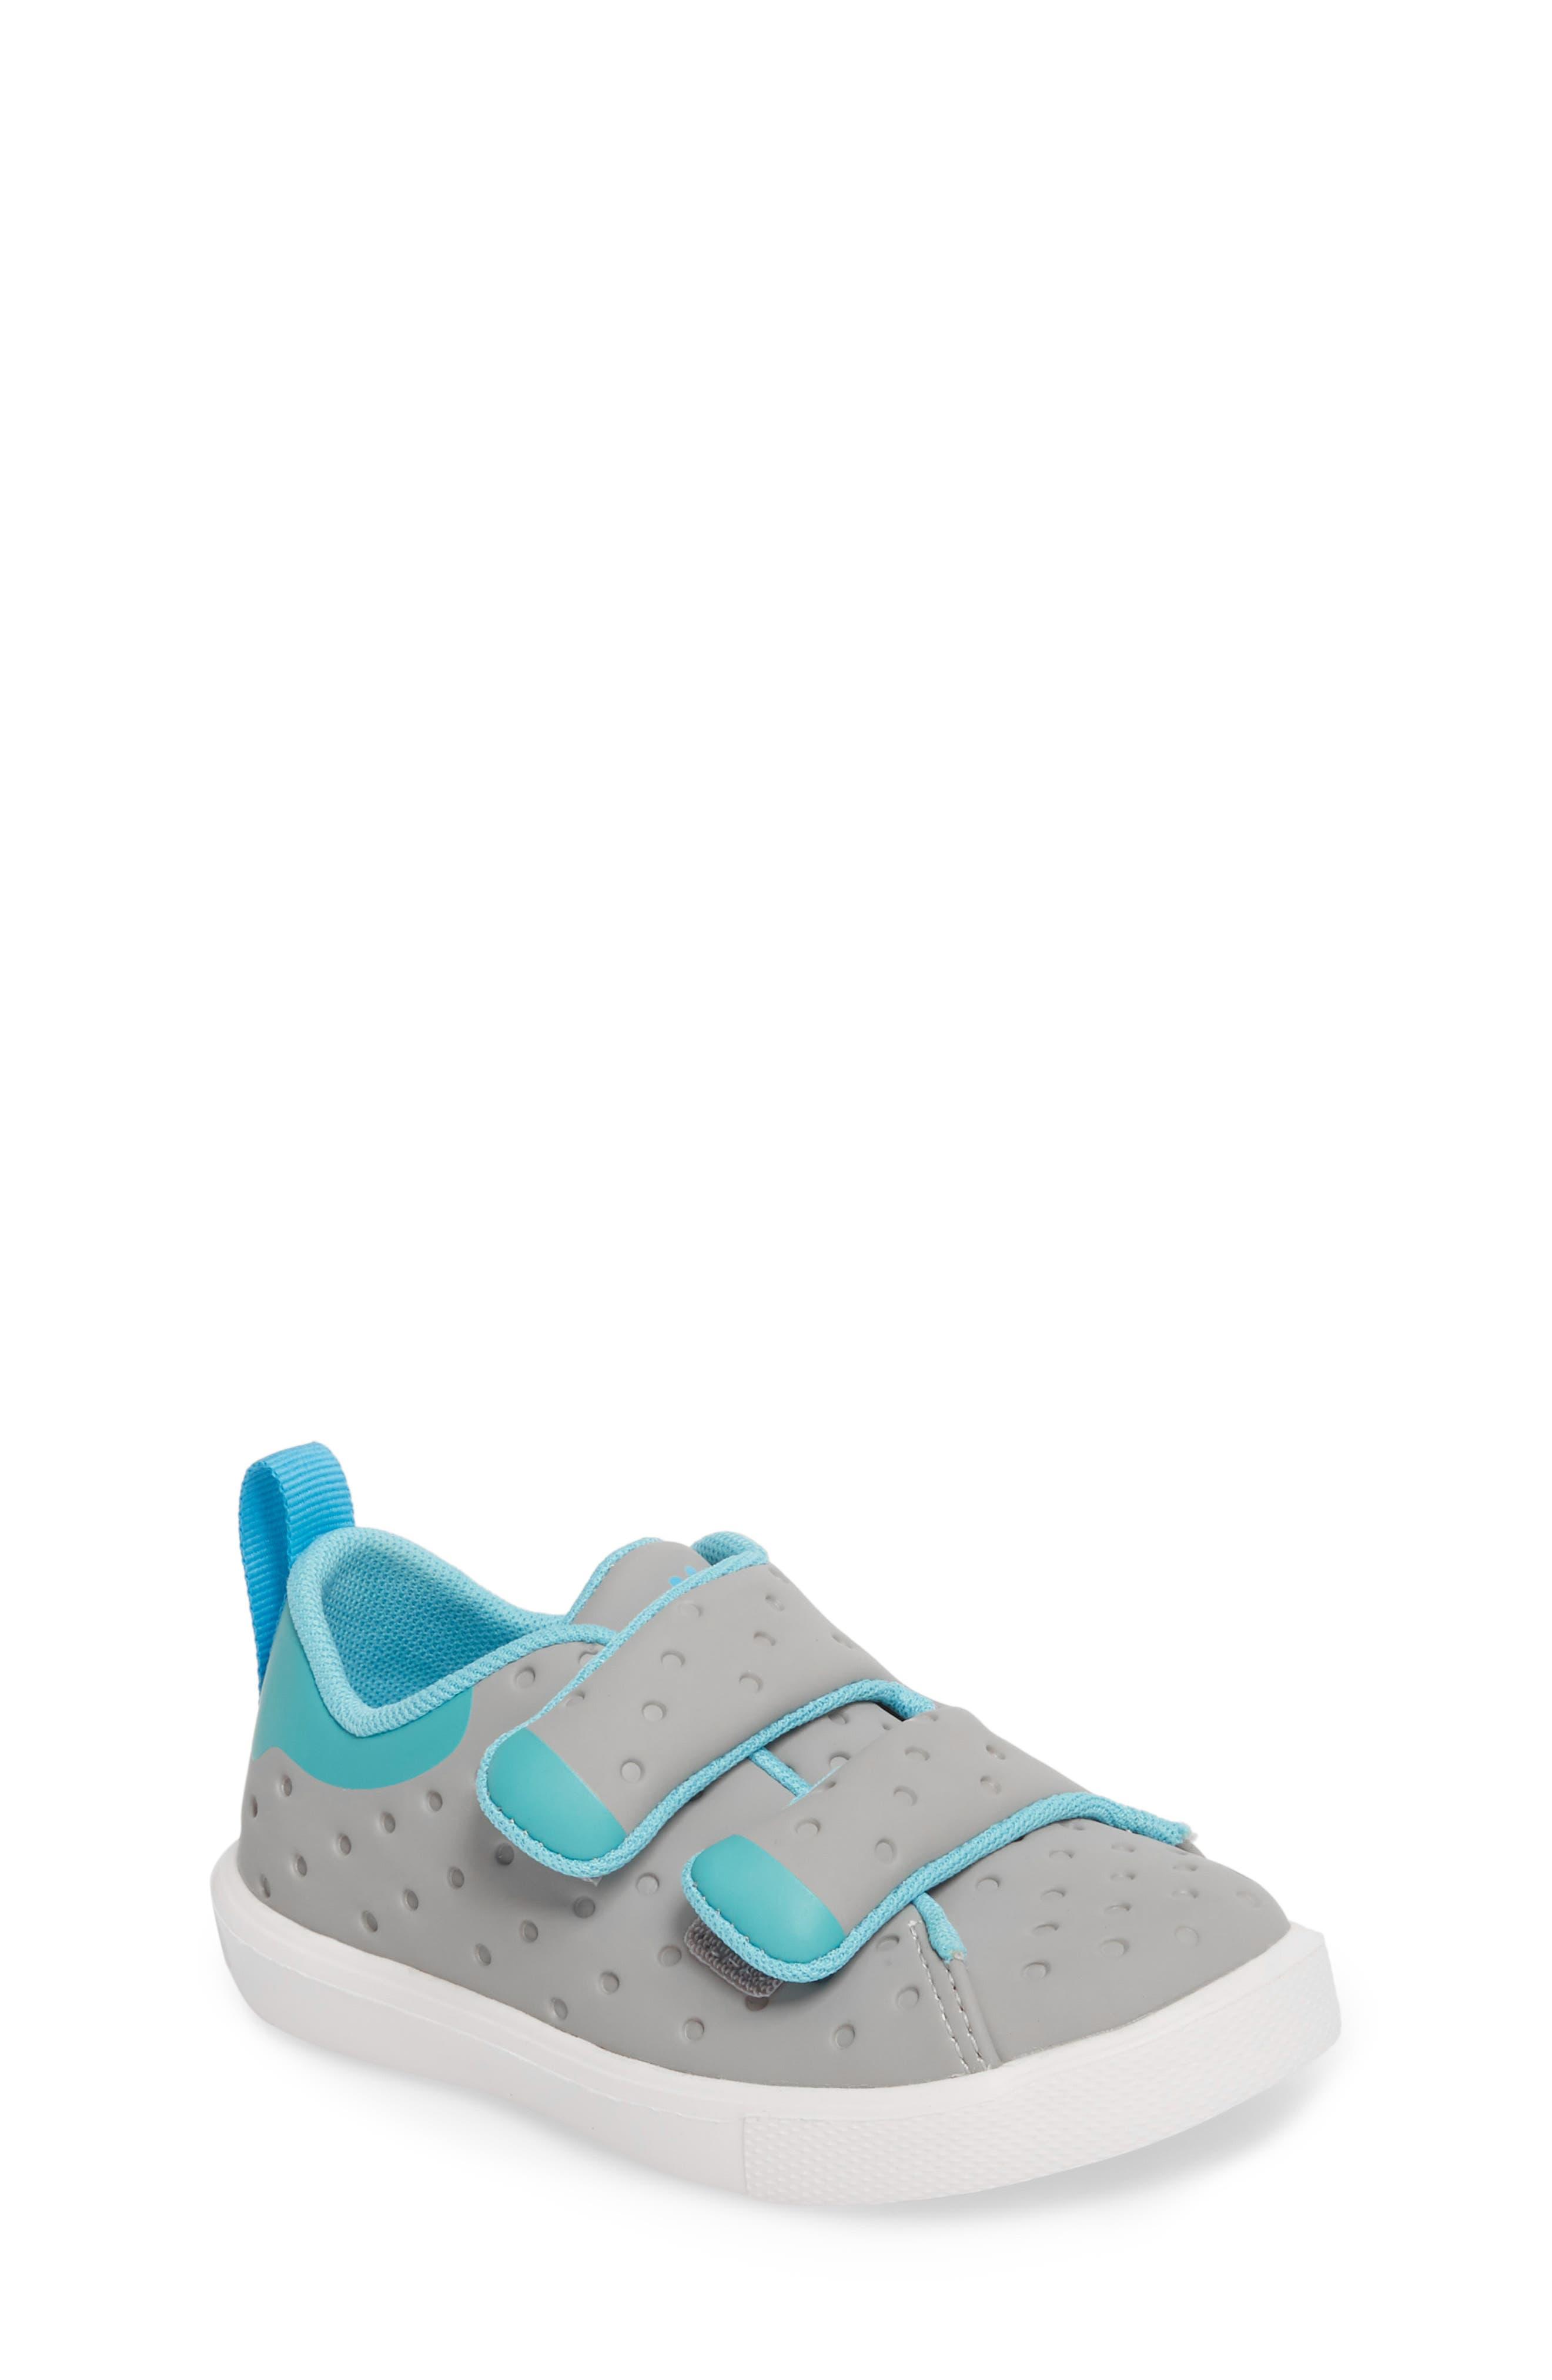 Monaco Sneaker,                         Main,                         color, PIGEON GREY/ POOL BOOL/ WHITE